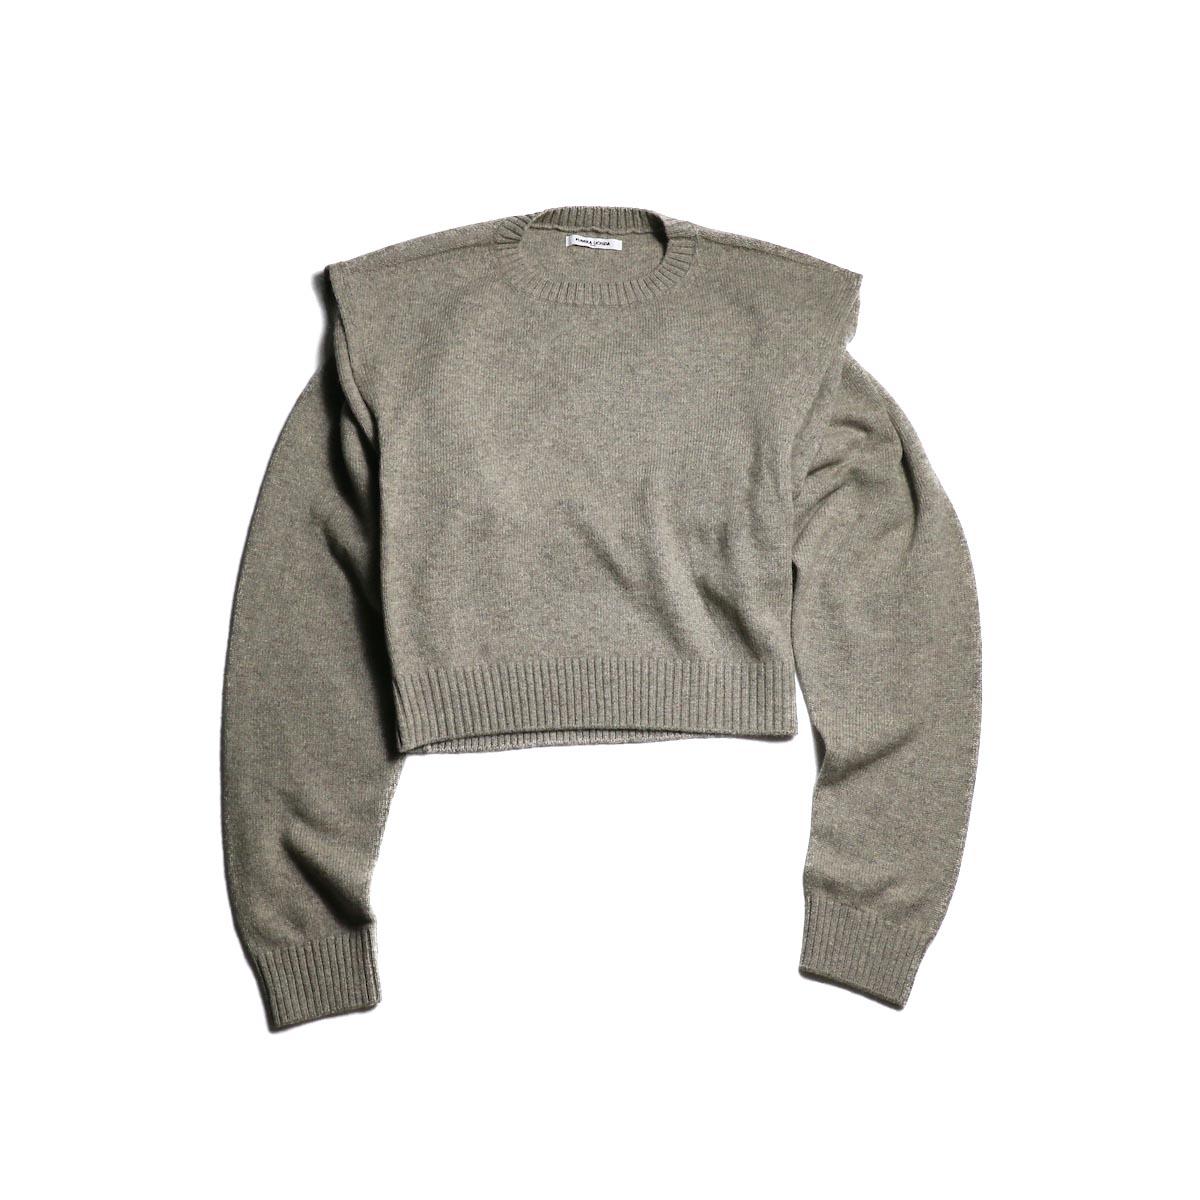 FUMIKA UCHIDA / 7G Yak Separate-Back Sweater (Gray)